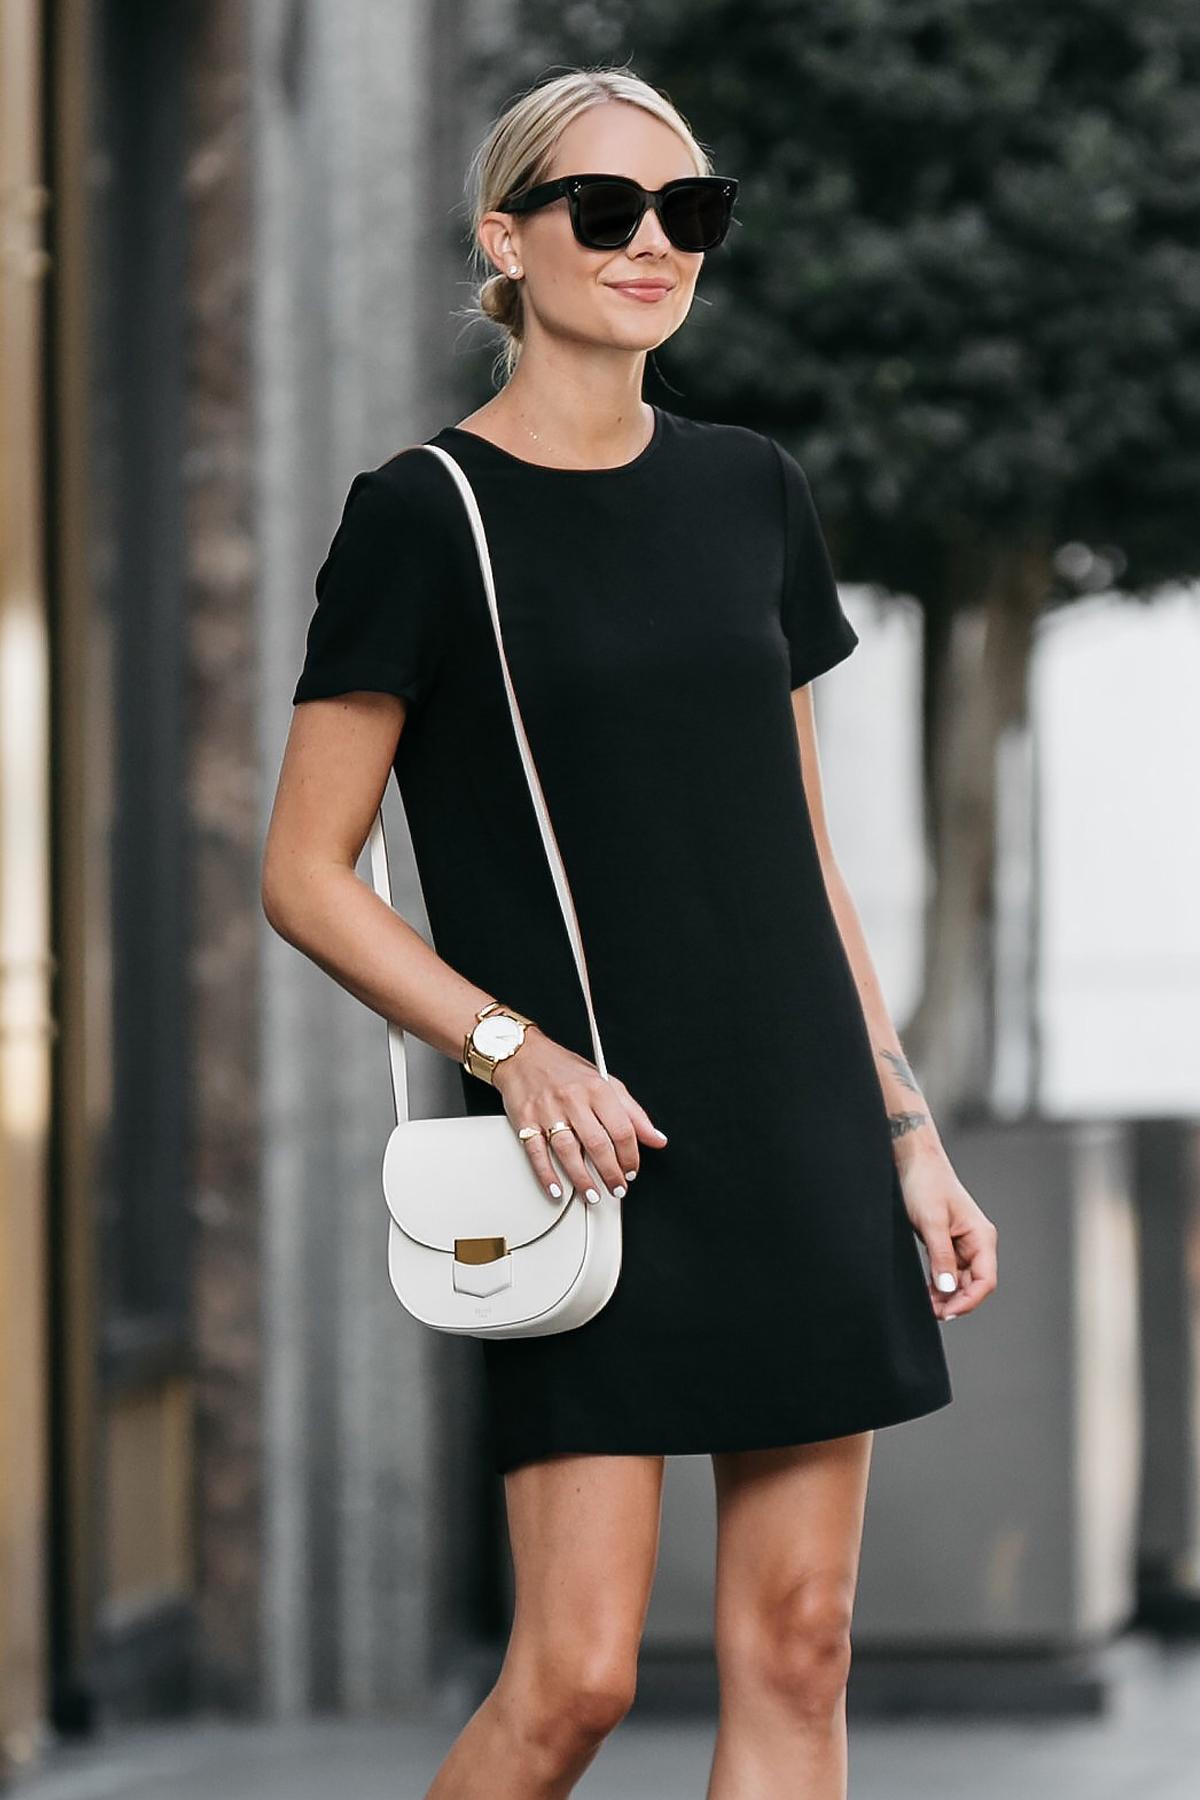 Blonde Wearing Nordstrom Black Shift Dress Outfit Celine White Trotteur Handbag Fashion Jackson Dallas Blogger Fashion Blogger Street Style